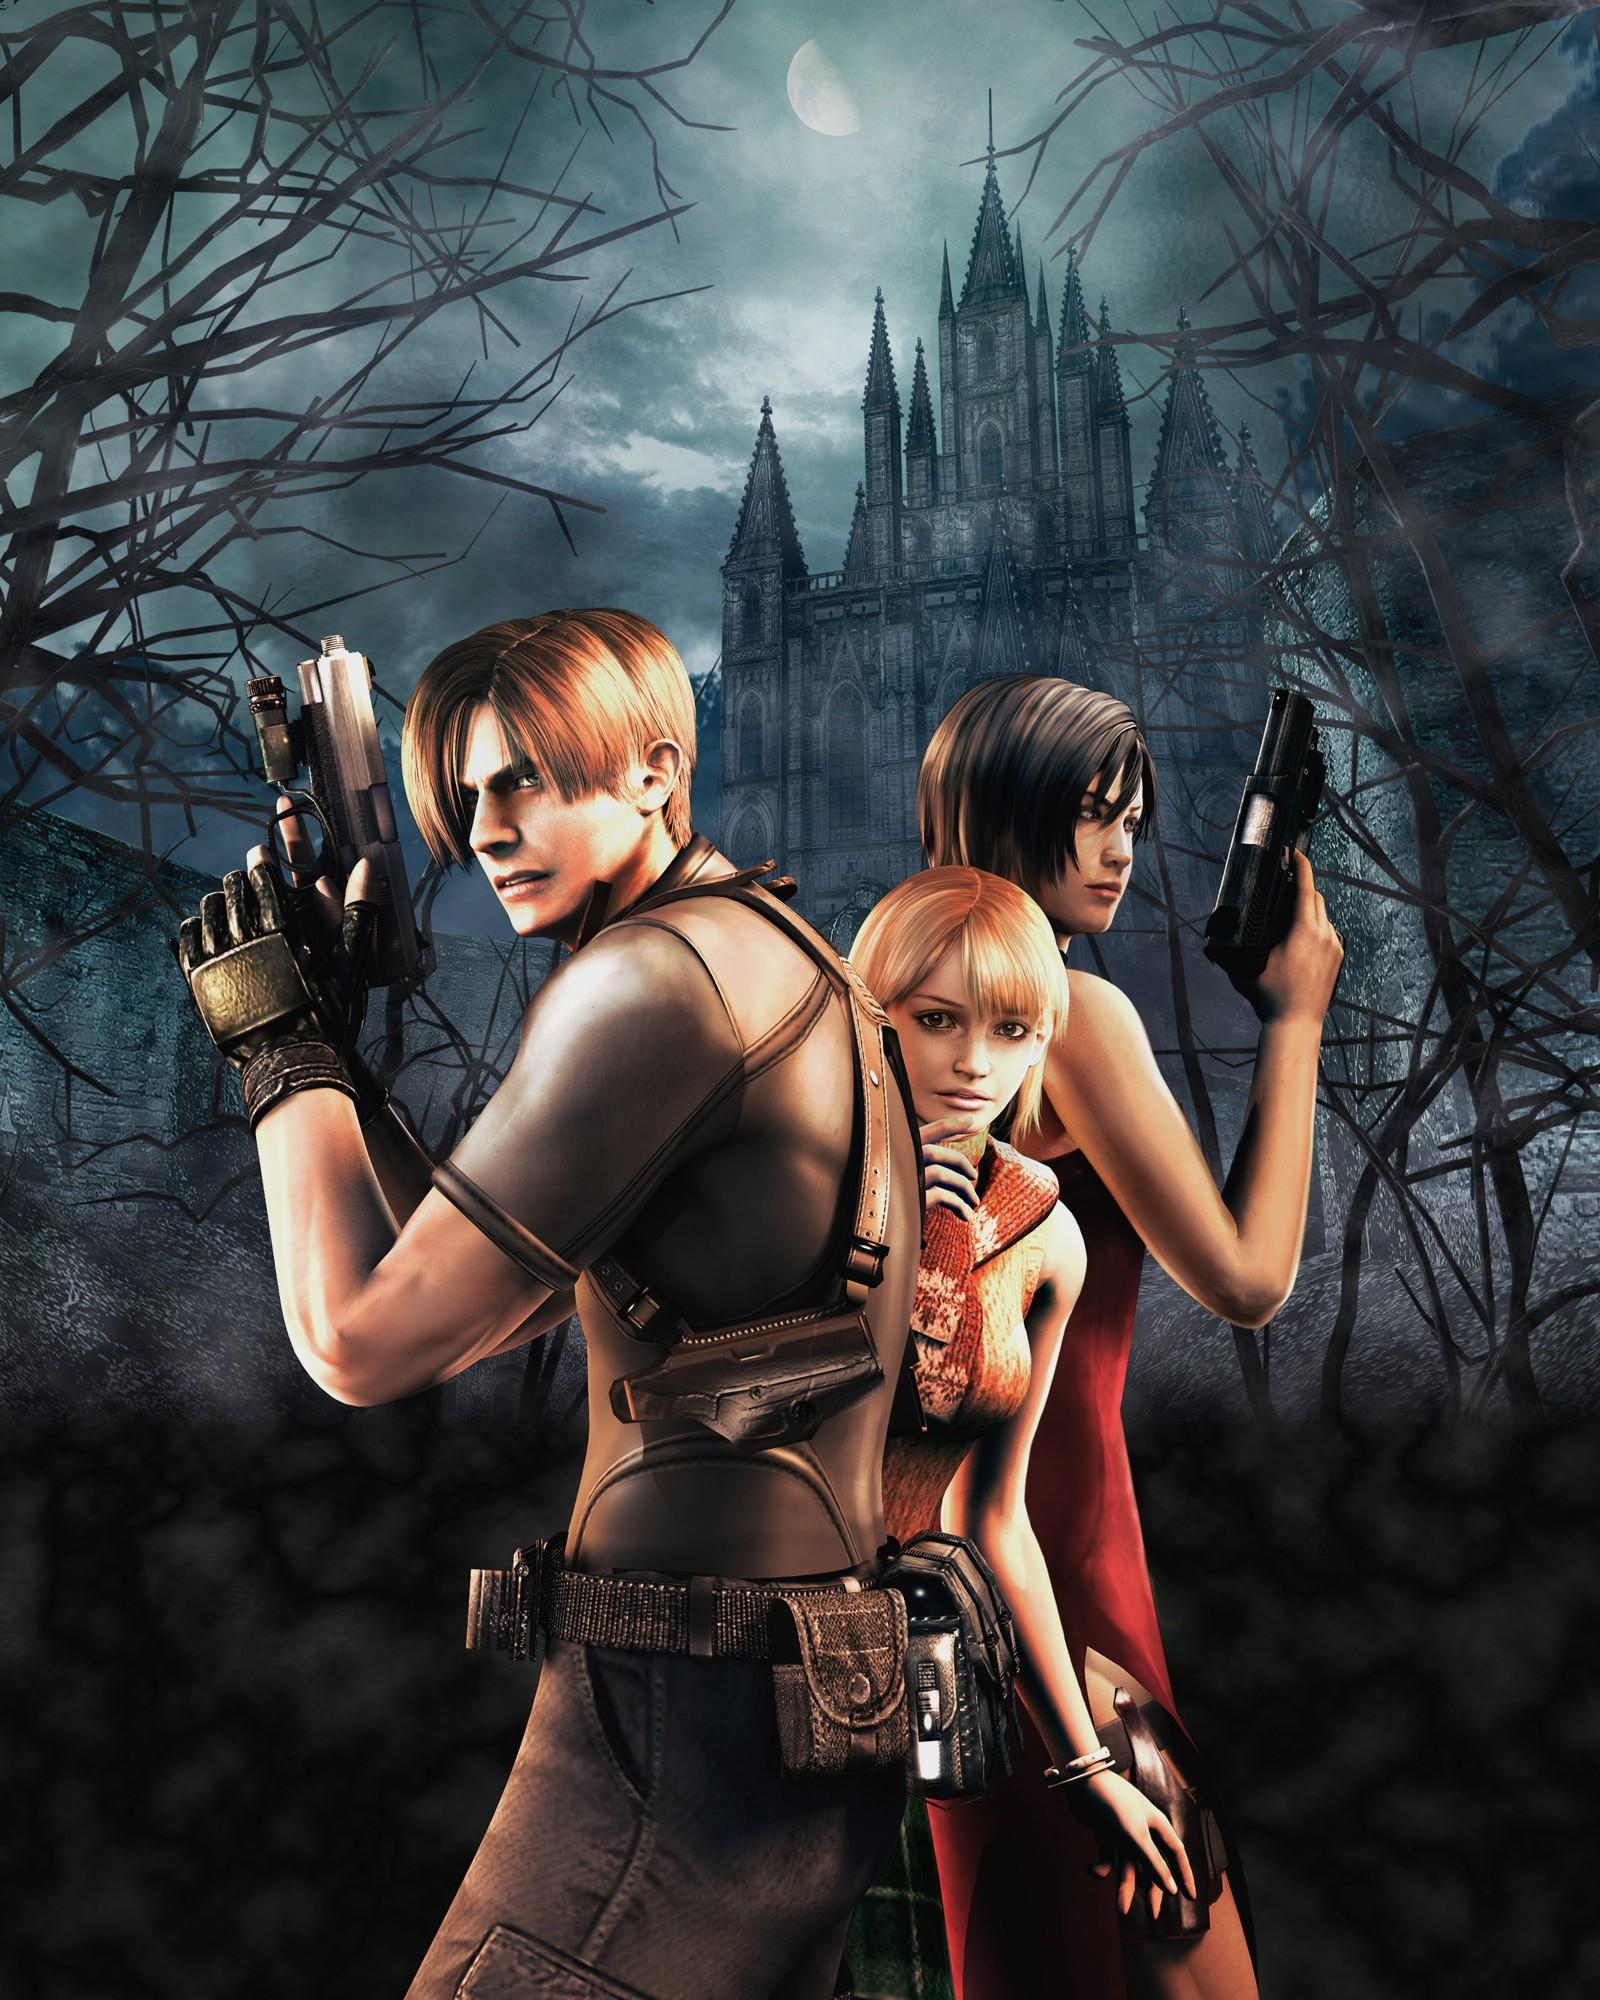 Evil Wallpapers: Resident Evil 4 Wallpaper HD Download